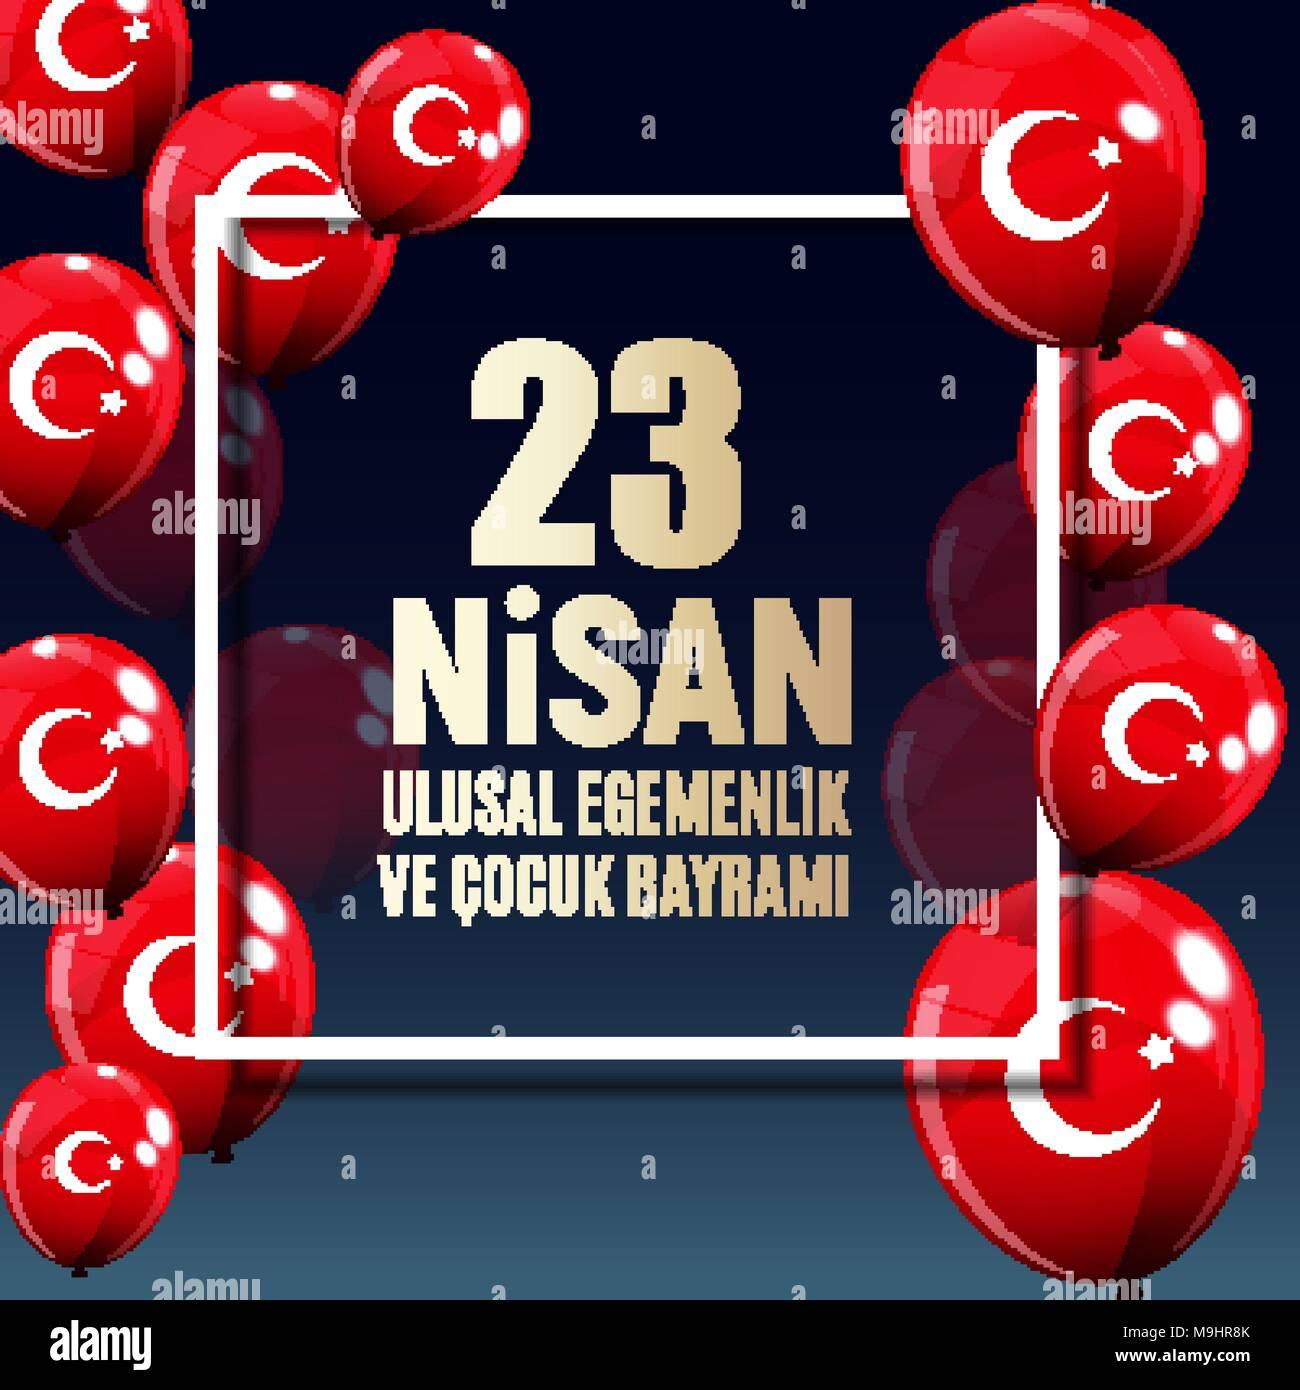 23 April Children's day (Turkish Speak: 23 Nisan Cumhuriyet Bayrami). Vector Illustration - Stock Vector